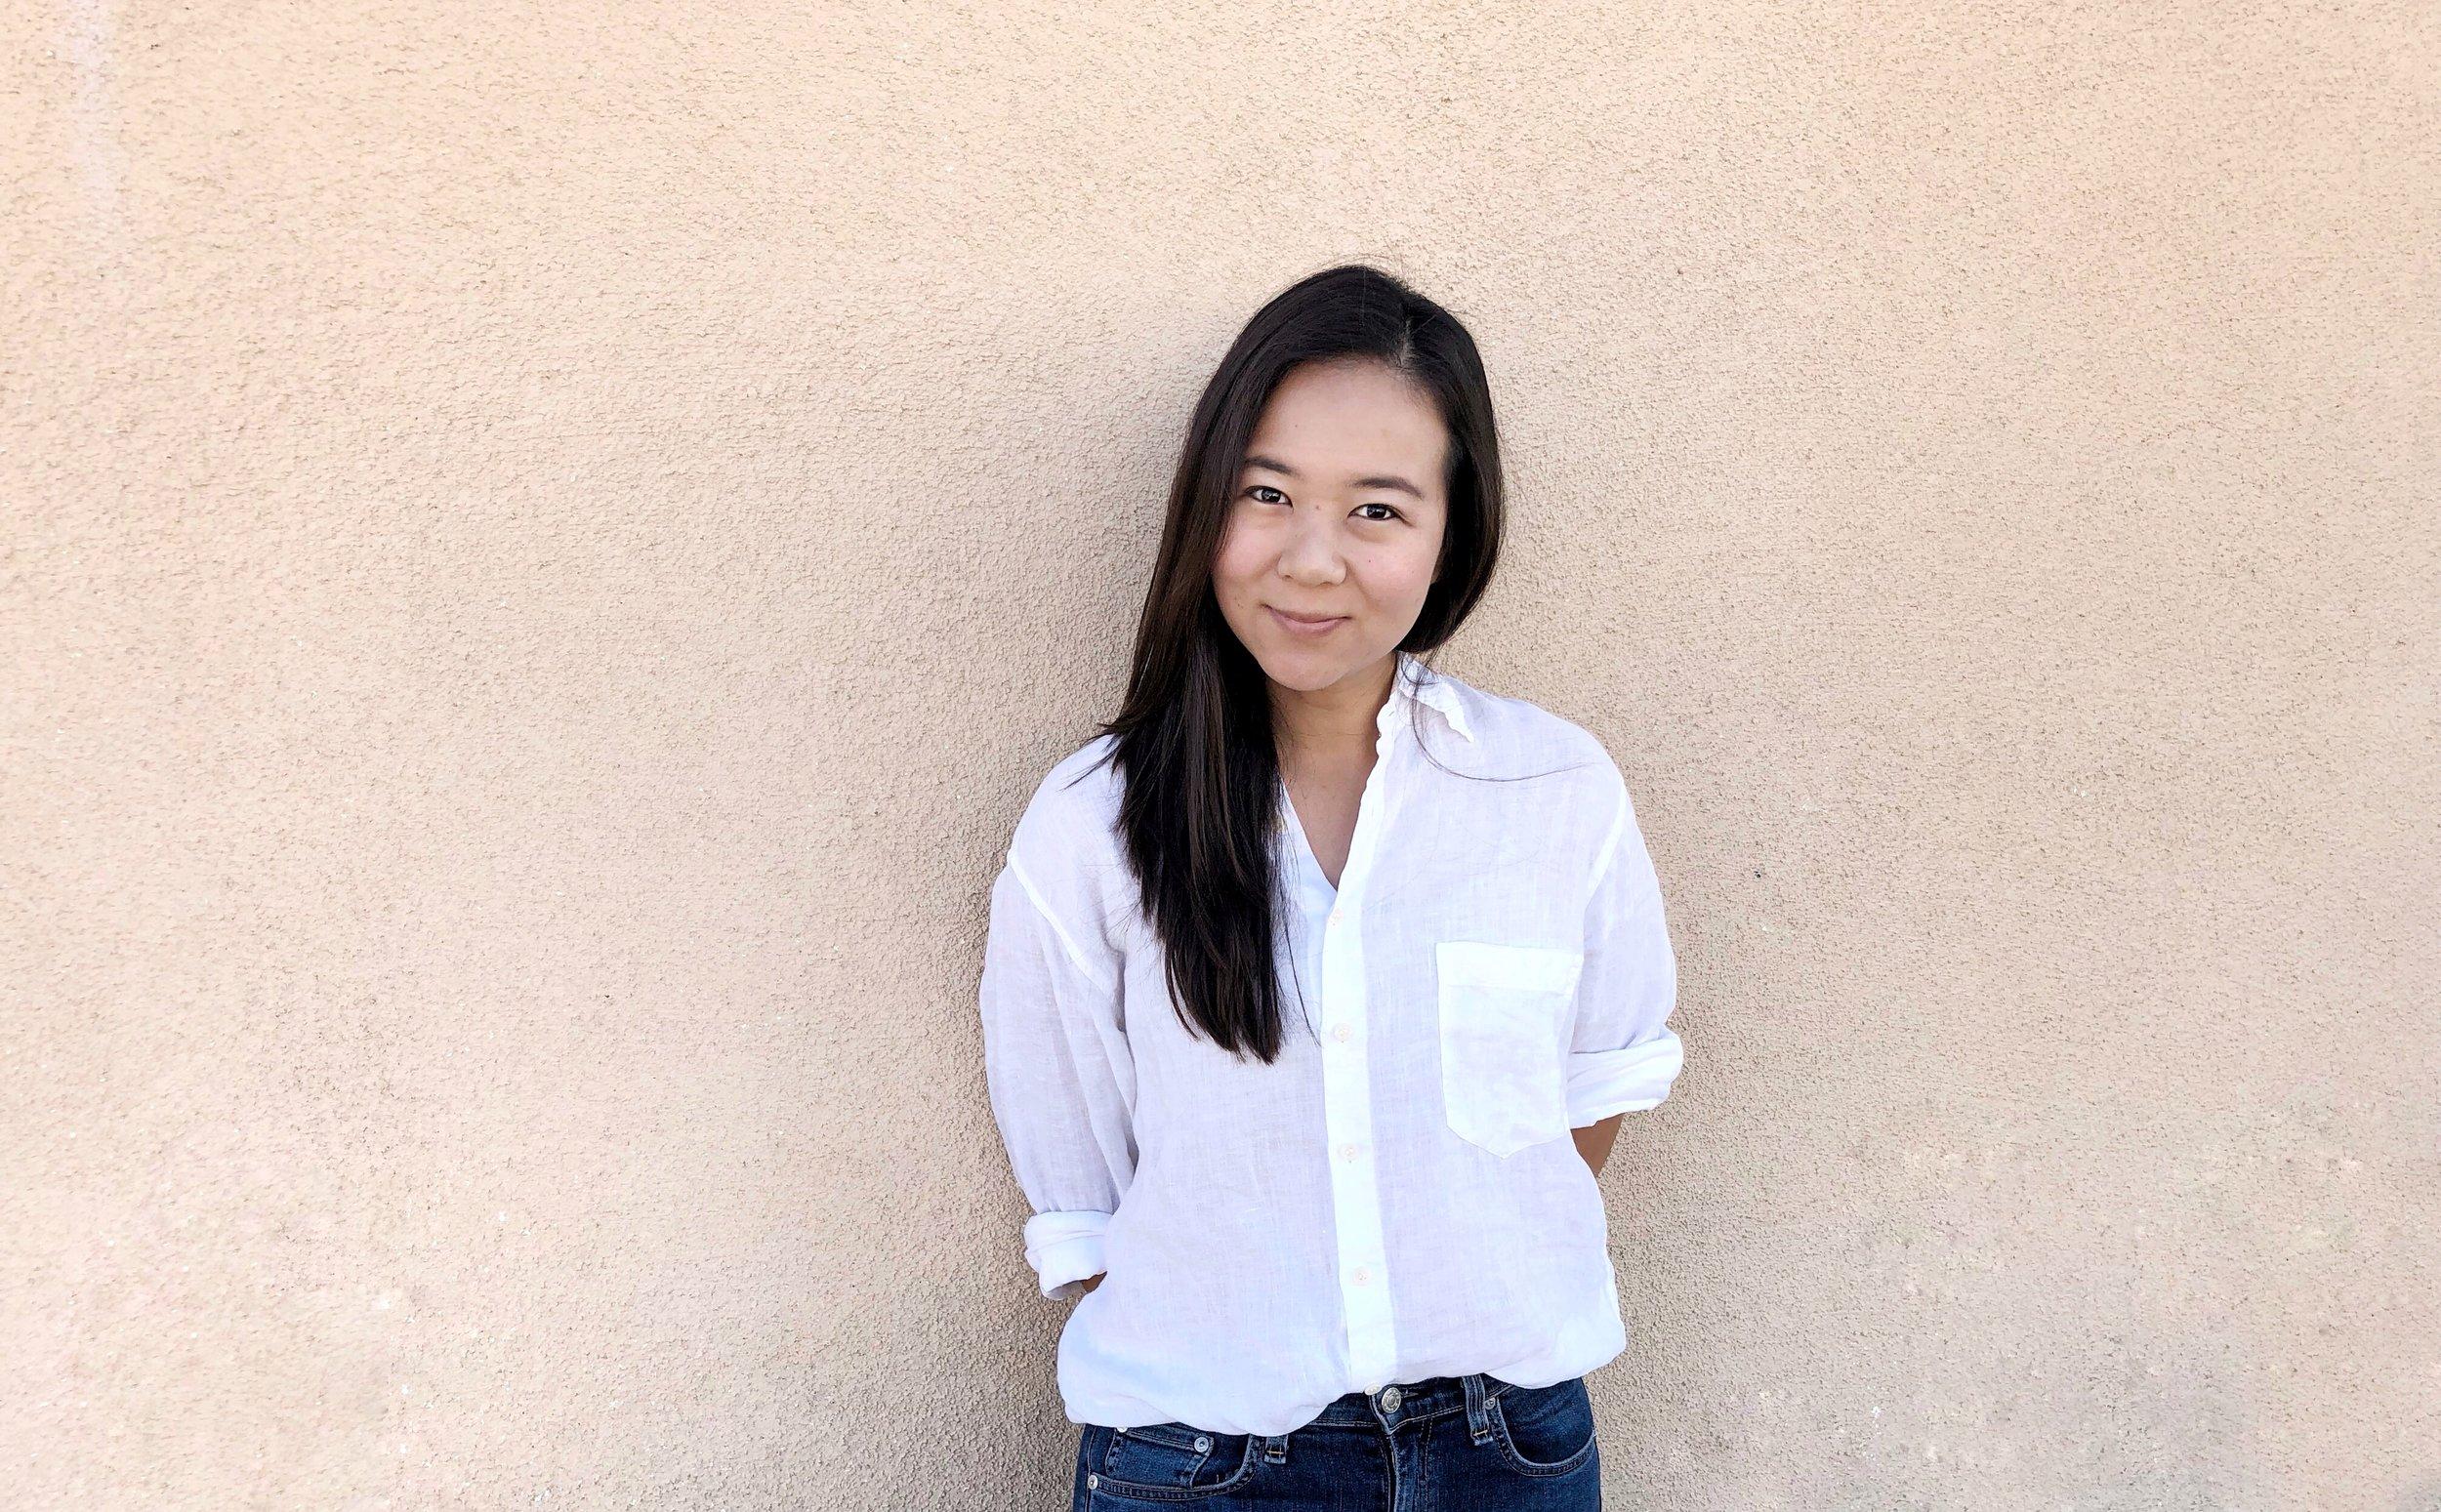 annie-chang-female-entrepreneur-women-business-verb-blog-mgmt-clothing-blog-wear-vegan-weareorelse